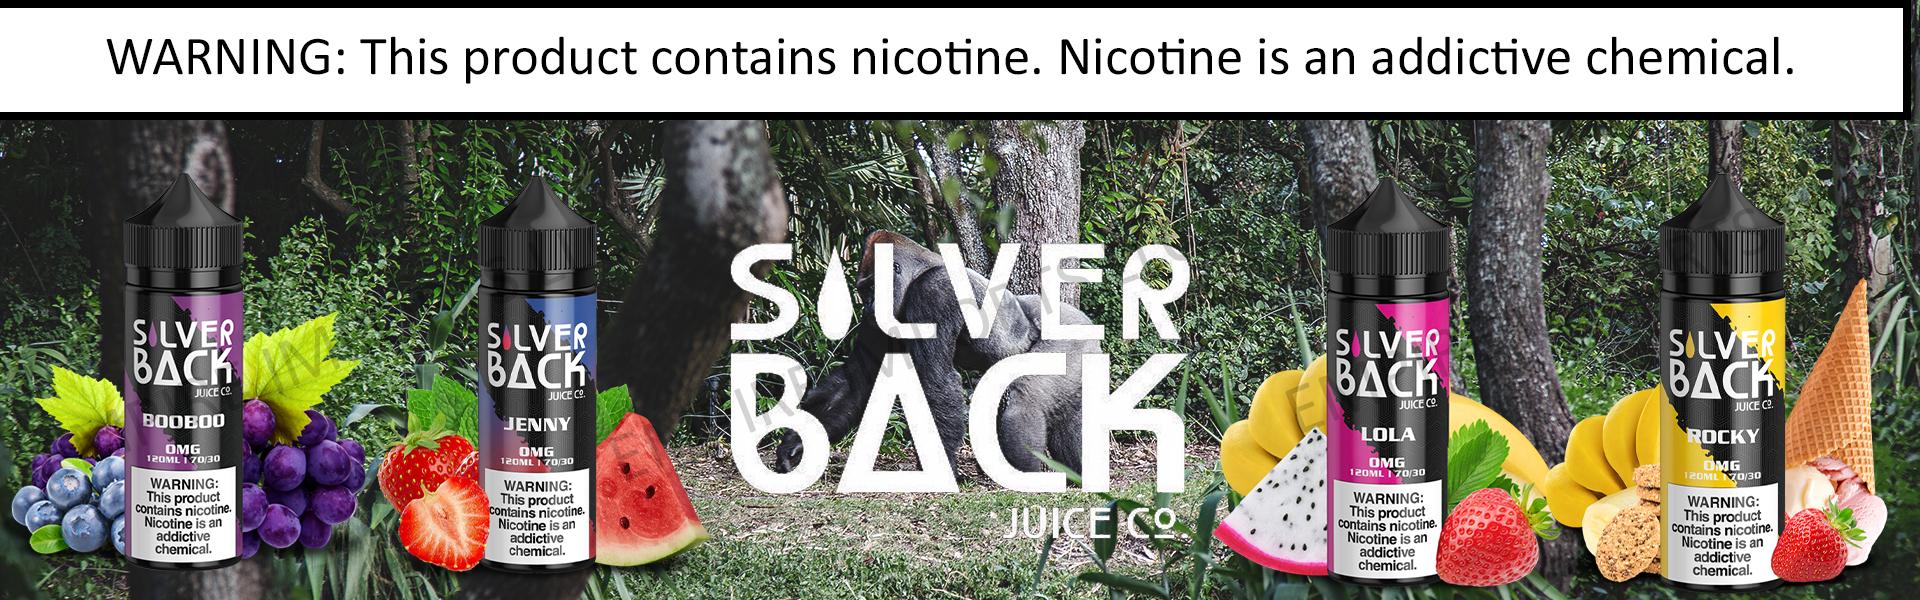 silverback-banner.jpg